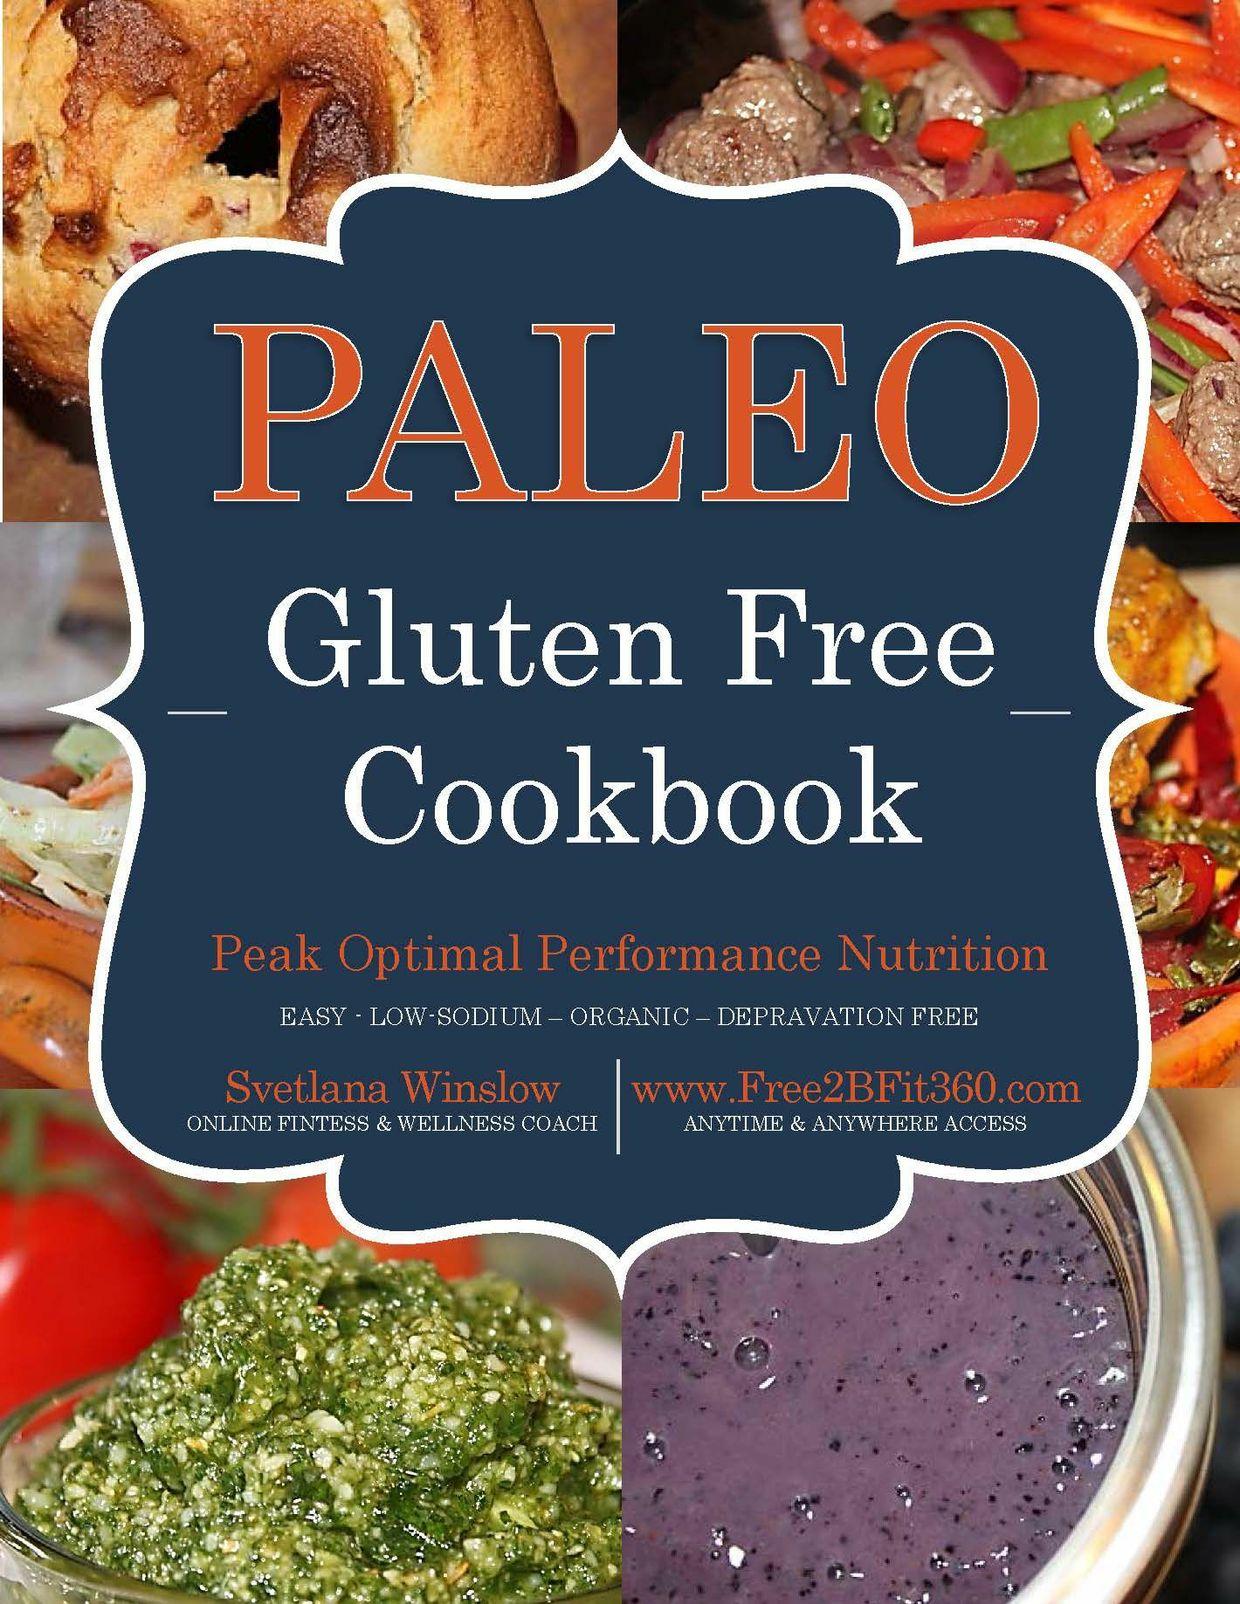 Paleo Gluten Free eCookbook